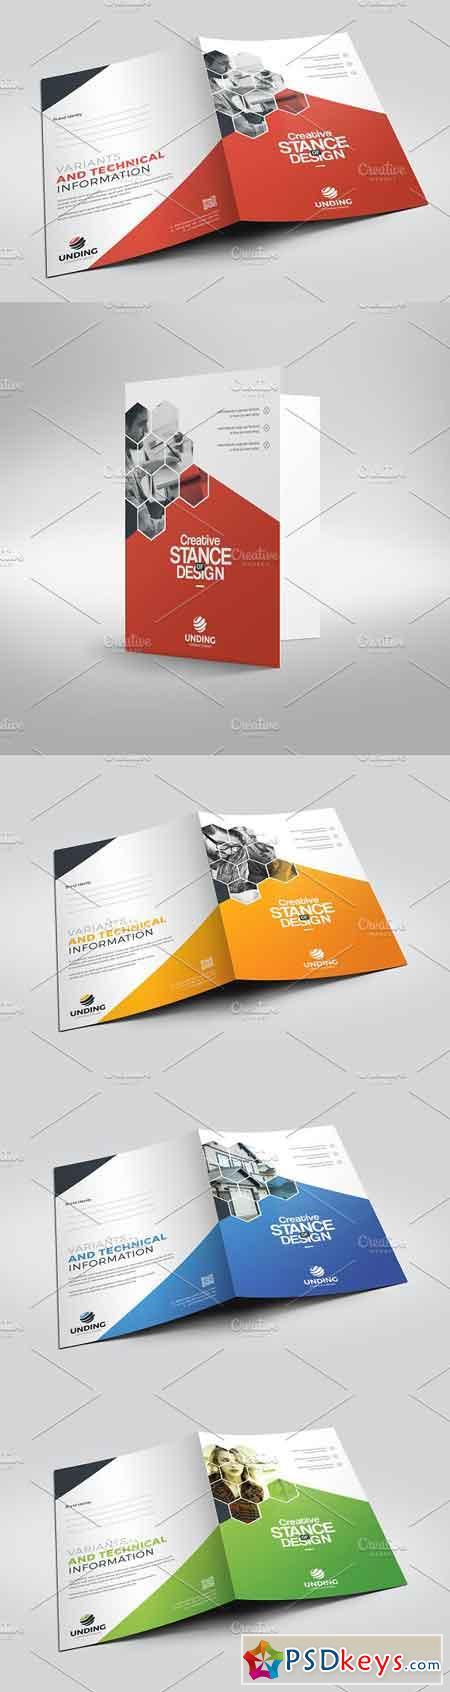 Presentation Folder 3277477